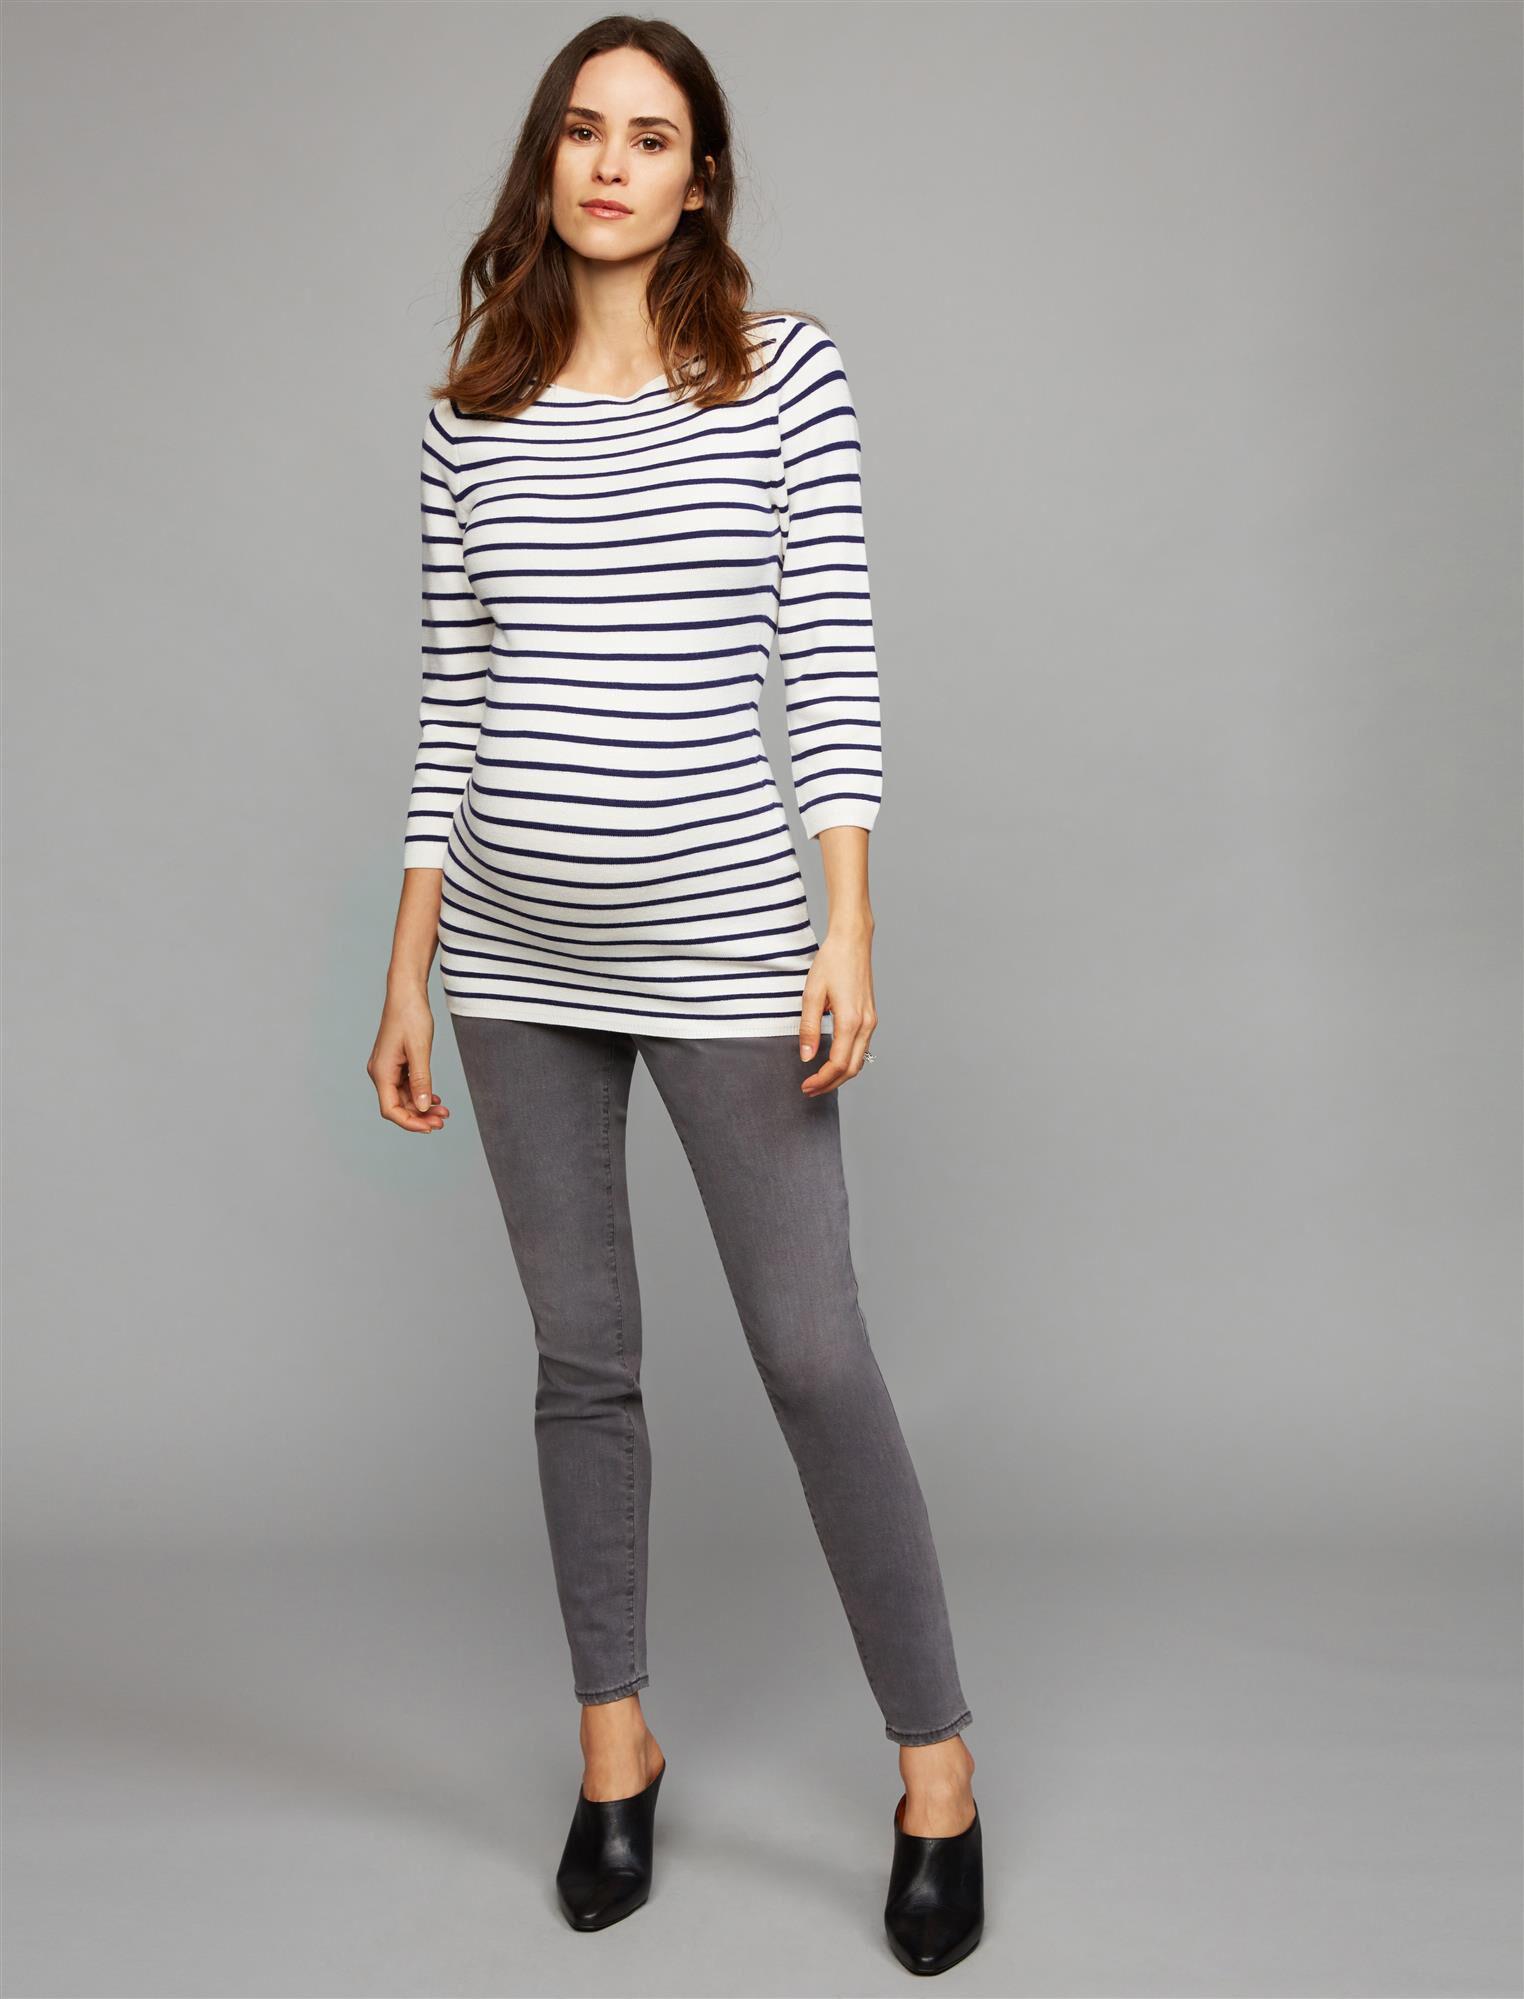 Luxe Essentials Denim Secret Fit Belly Skinny Leg Maternity Jeans